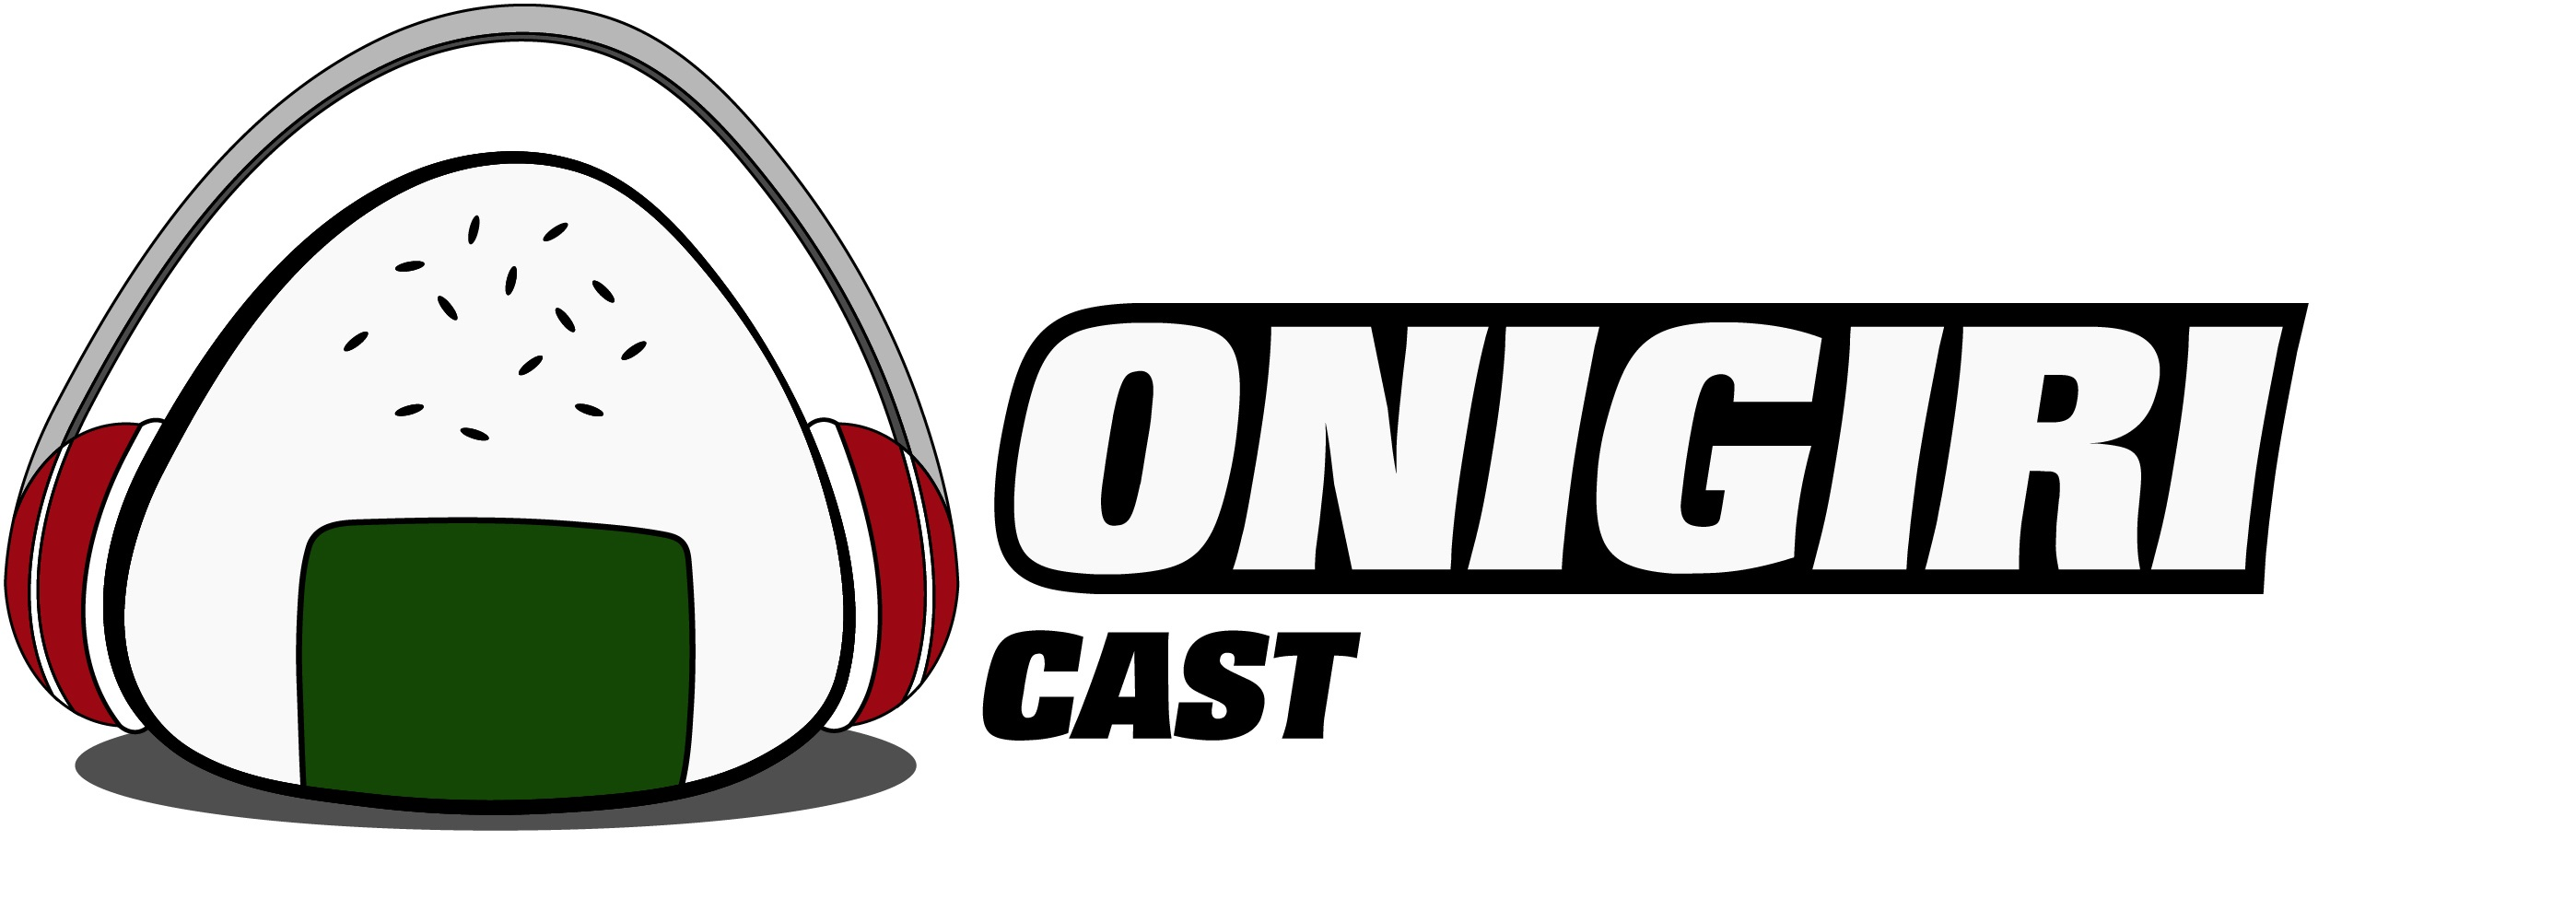 Oniguiri final 02